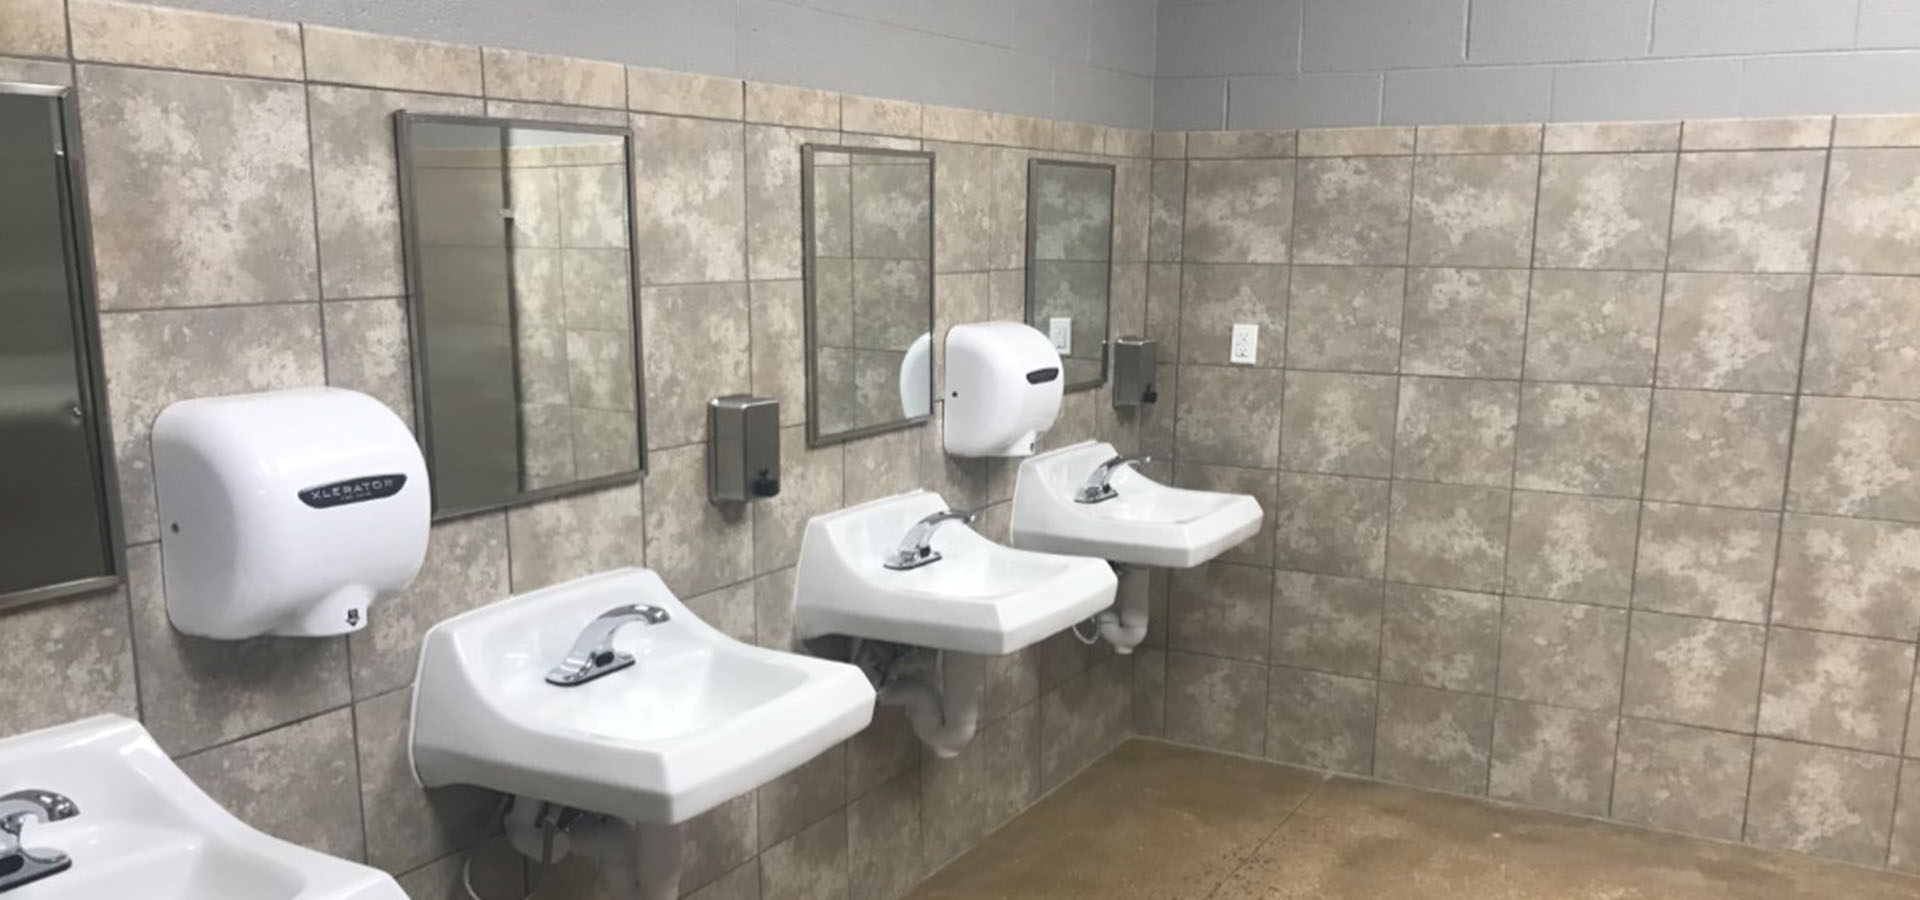 Clayton Homes | Restroom Renovation | Brindley Construction